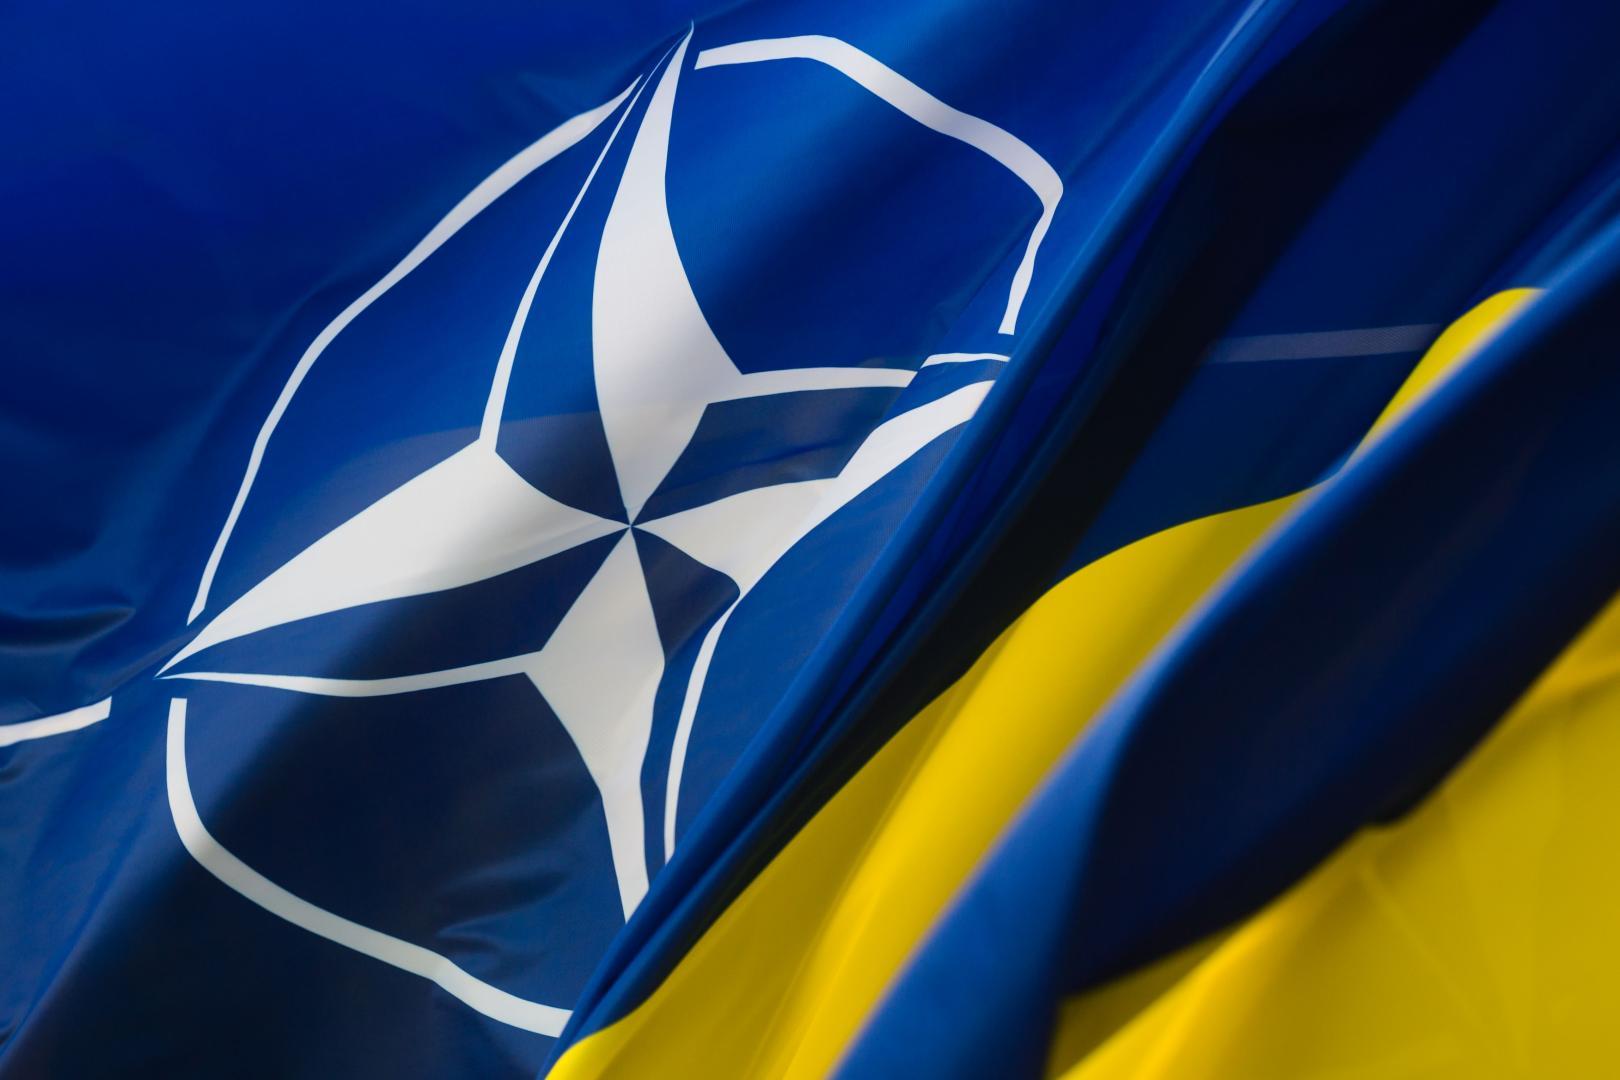 Poroșenko vrea ca Ucraina să adere la UE și NATO